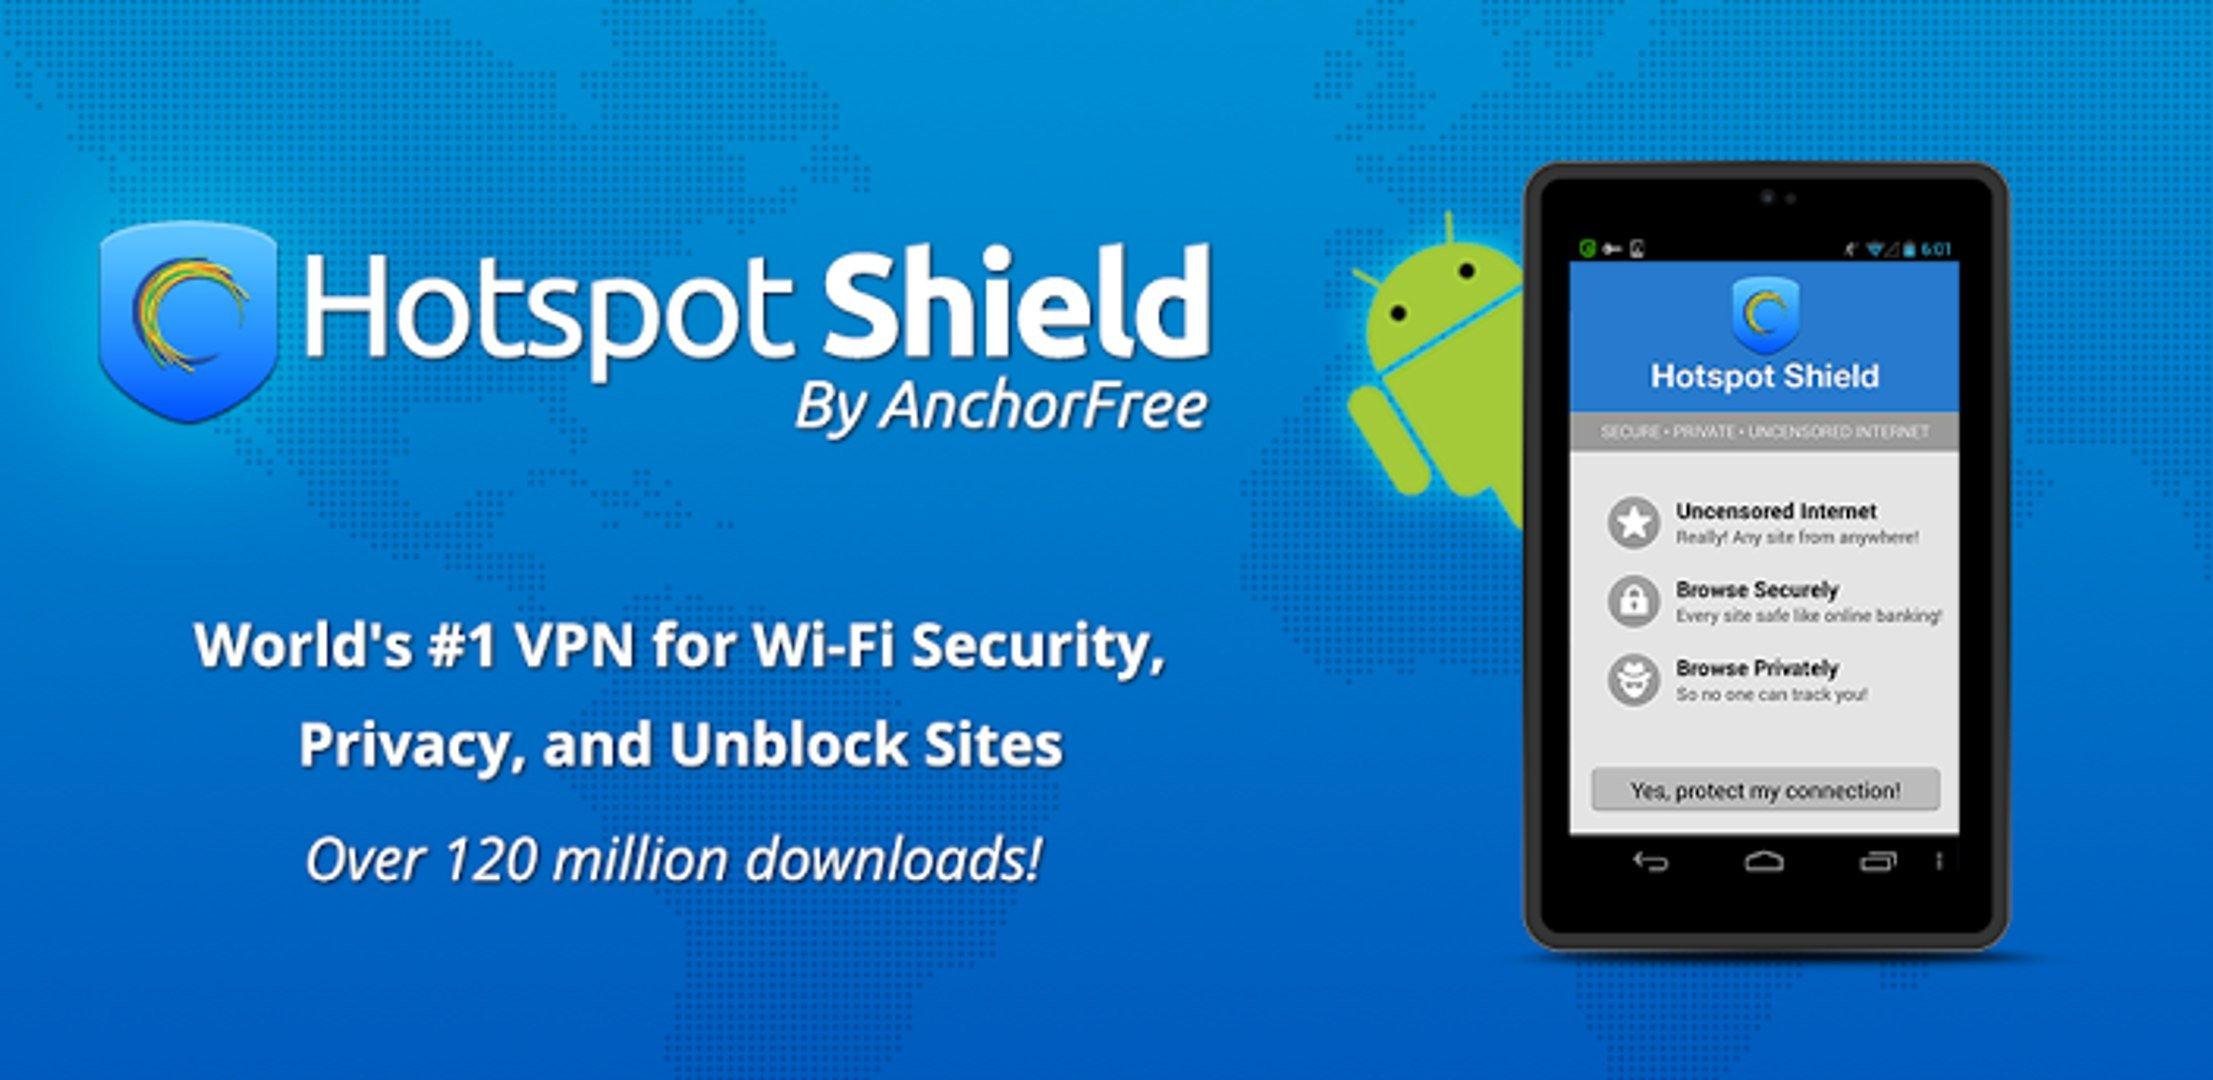 Hotspot Shield 1 DigitalMediaGlobe